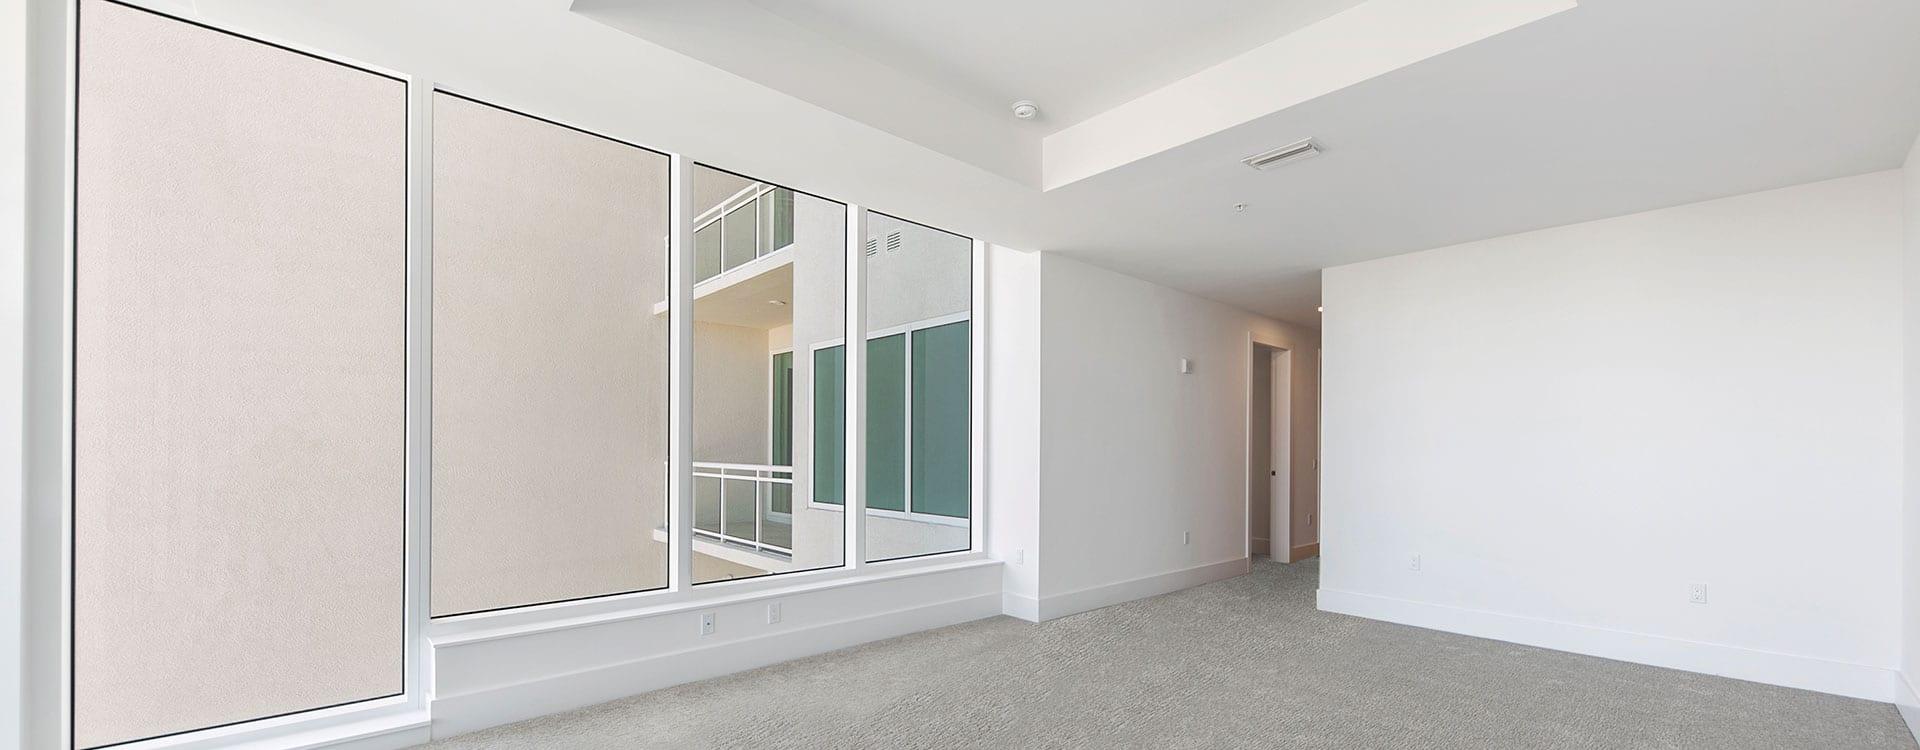 BLVD Residence 1503 bedroom